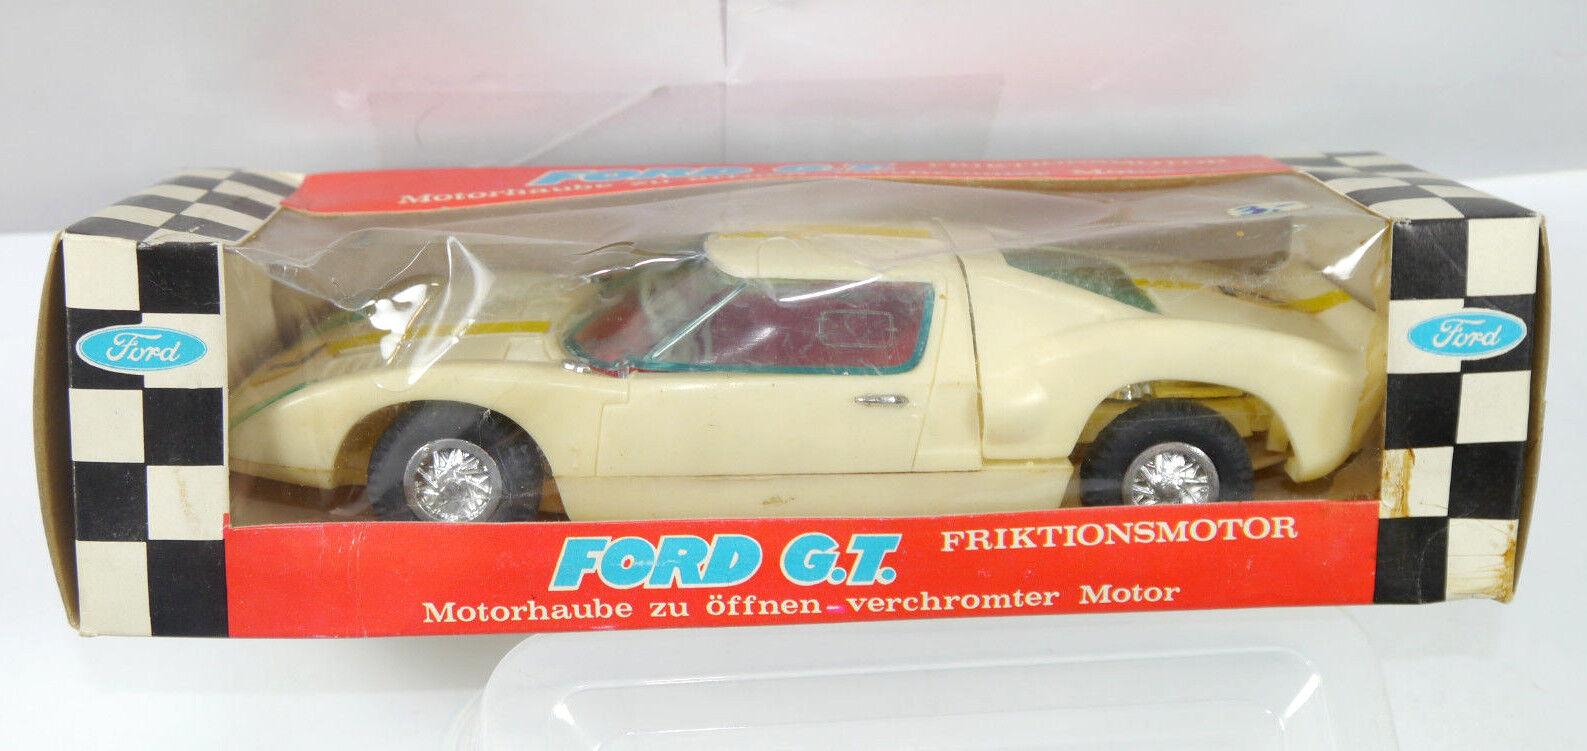 Europa 7145 Ford G.T.Friktionsmotor Plastic Model Car Ca.21cm - Boxed (K31)